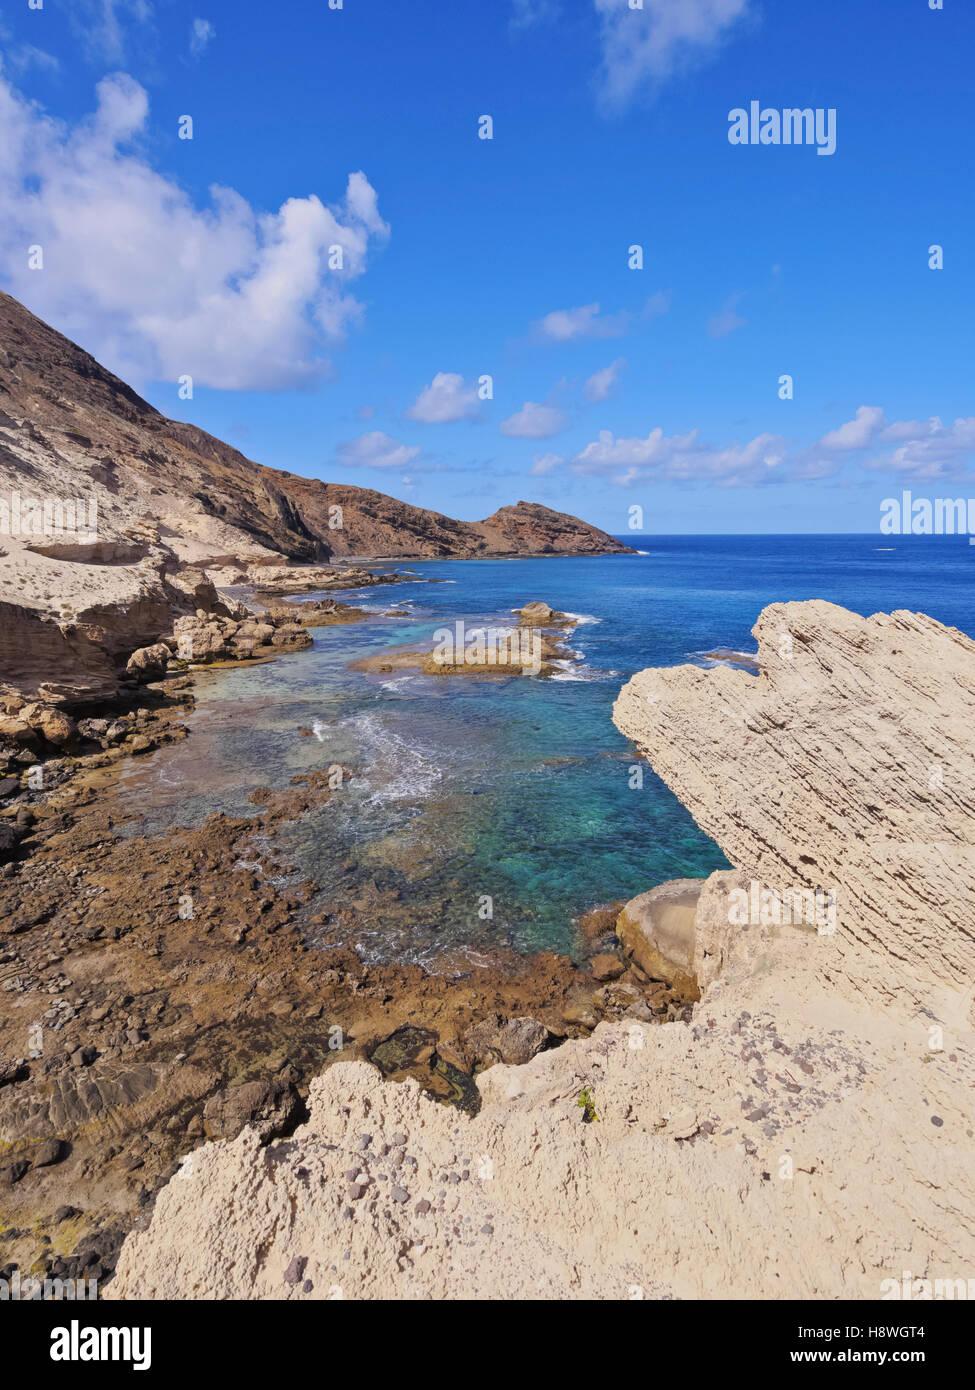 Portugal, Madeira Islands, Porto Santo, View of the shoreline of the island. - Stock Image